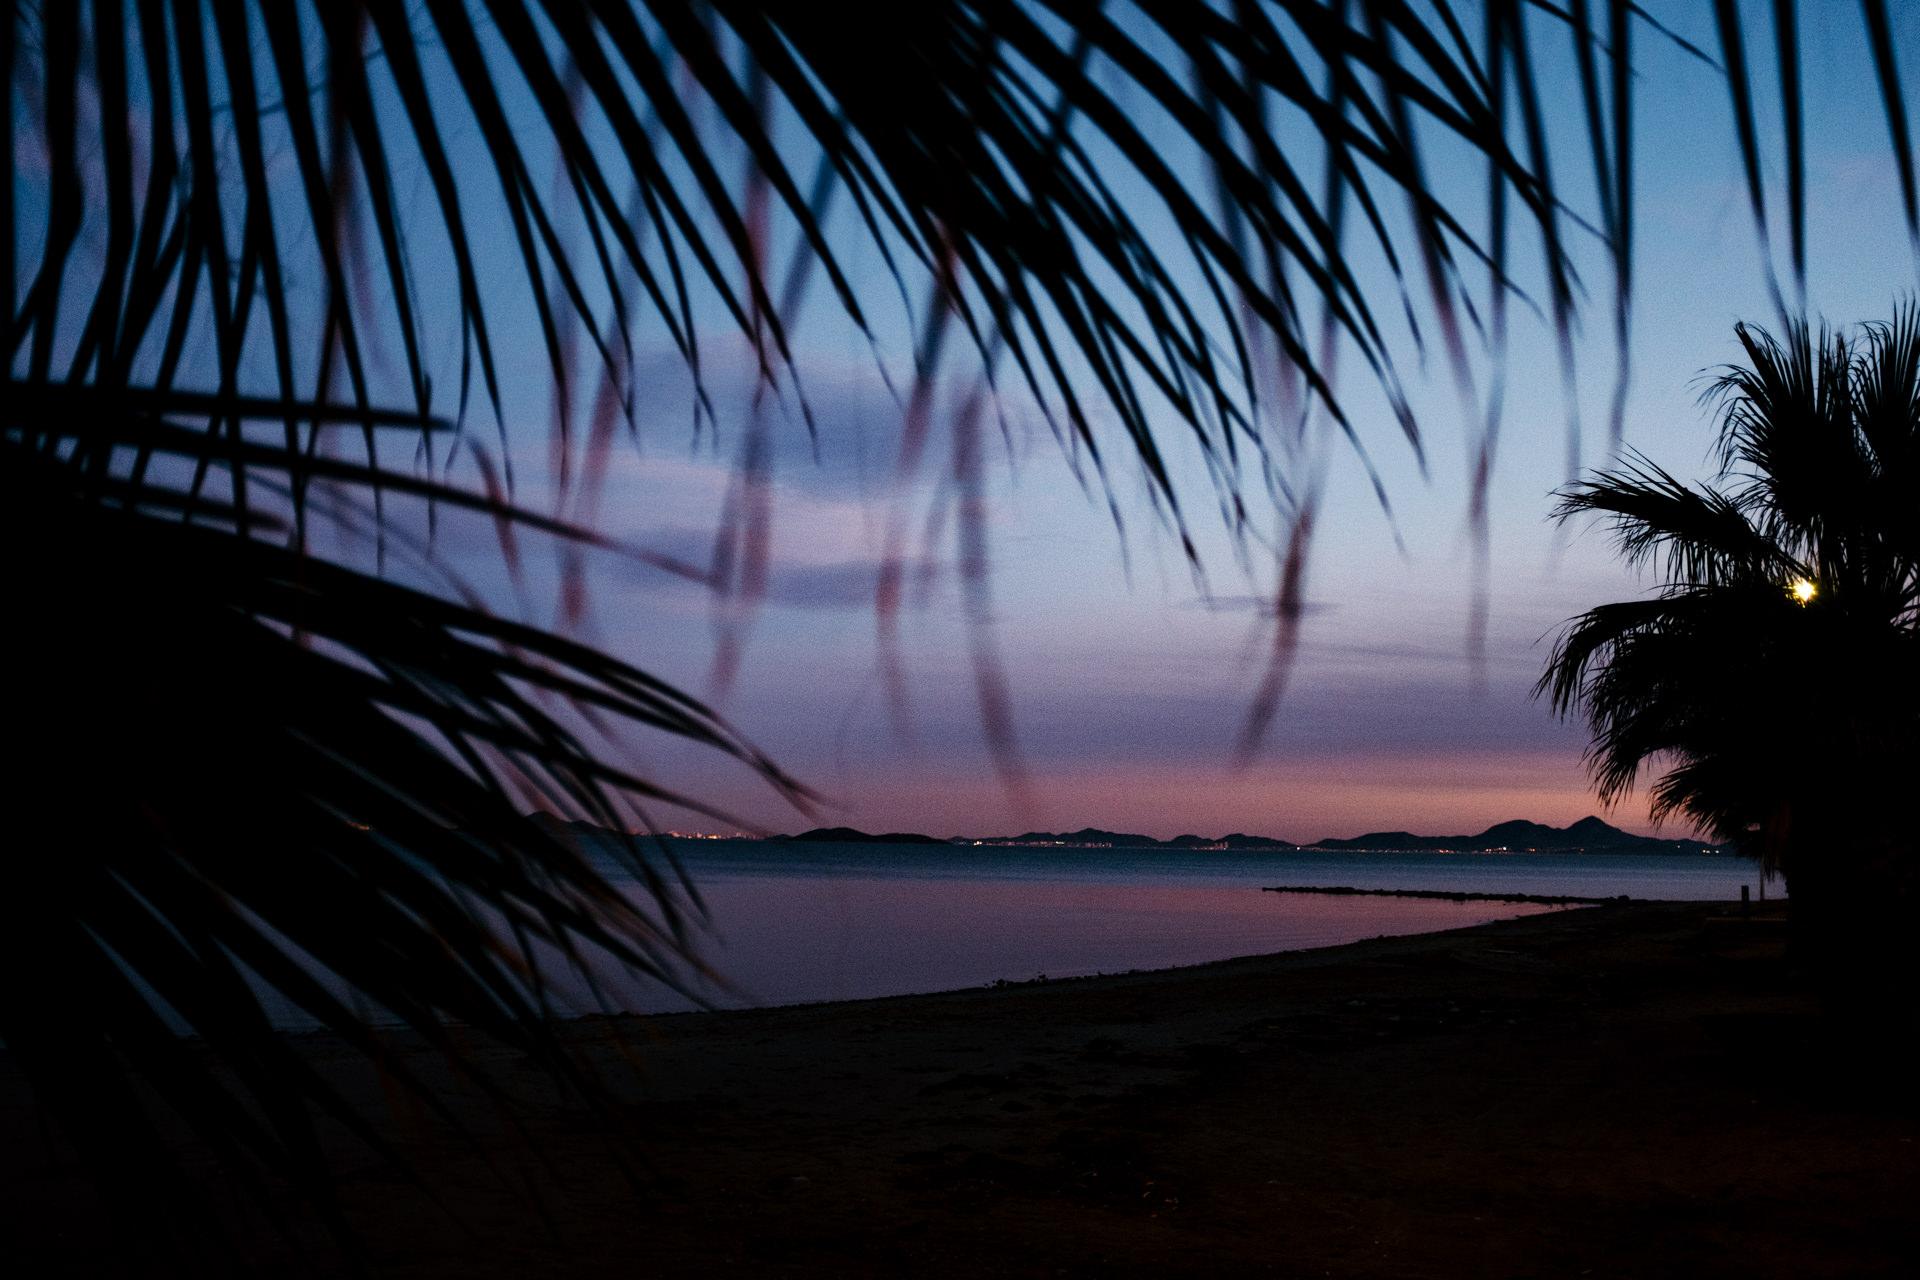 sunset in Los Alcazares, Spain 2019